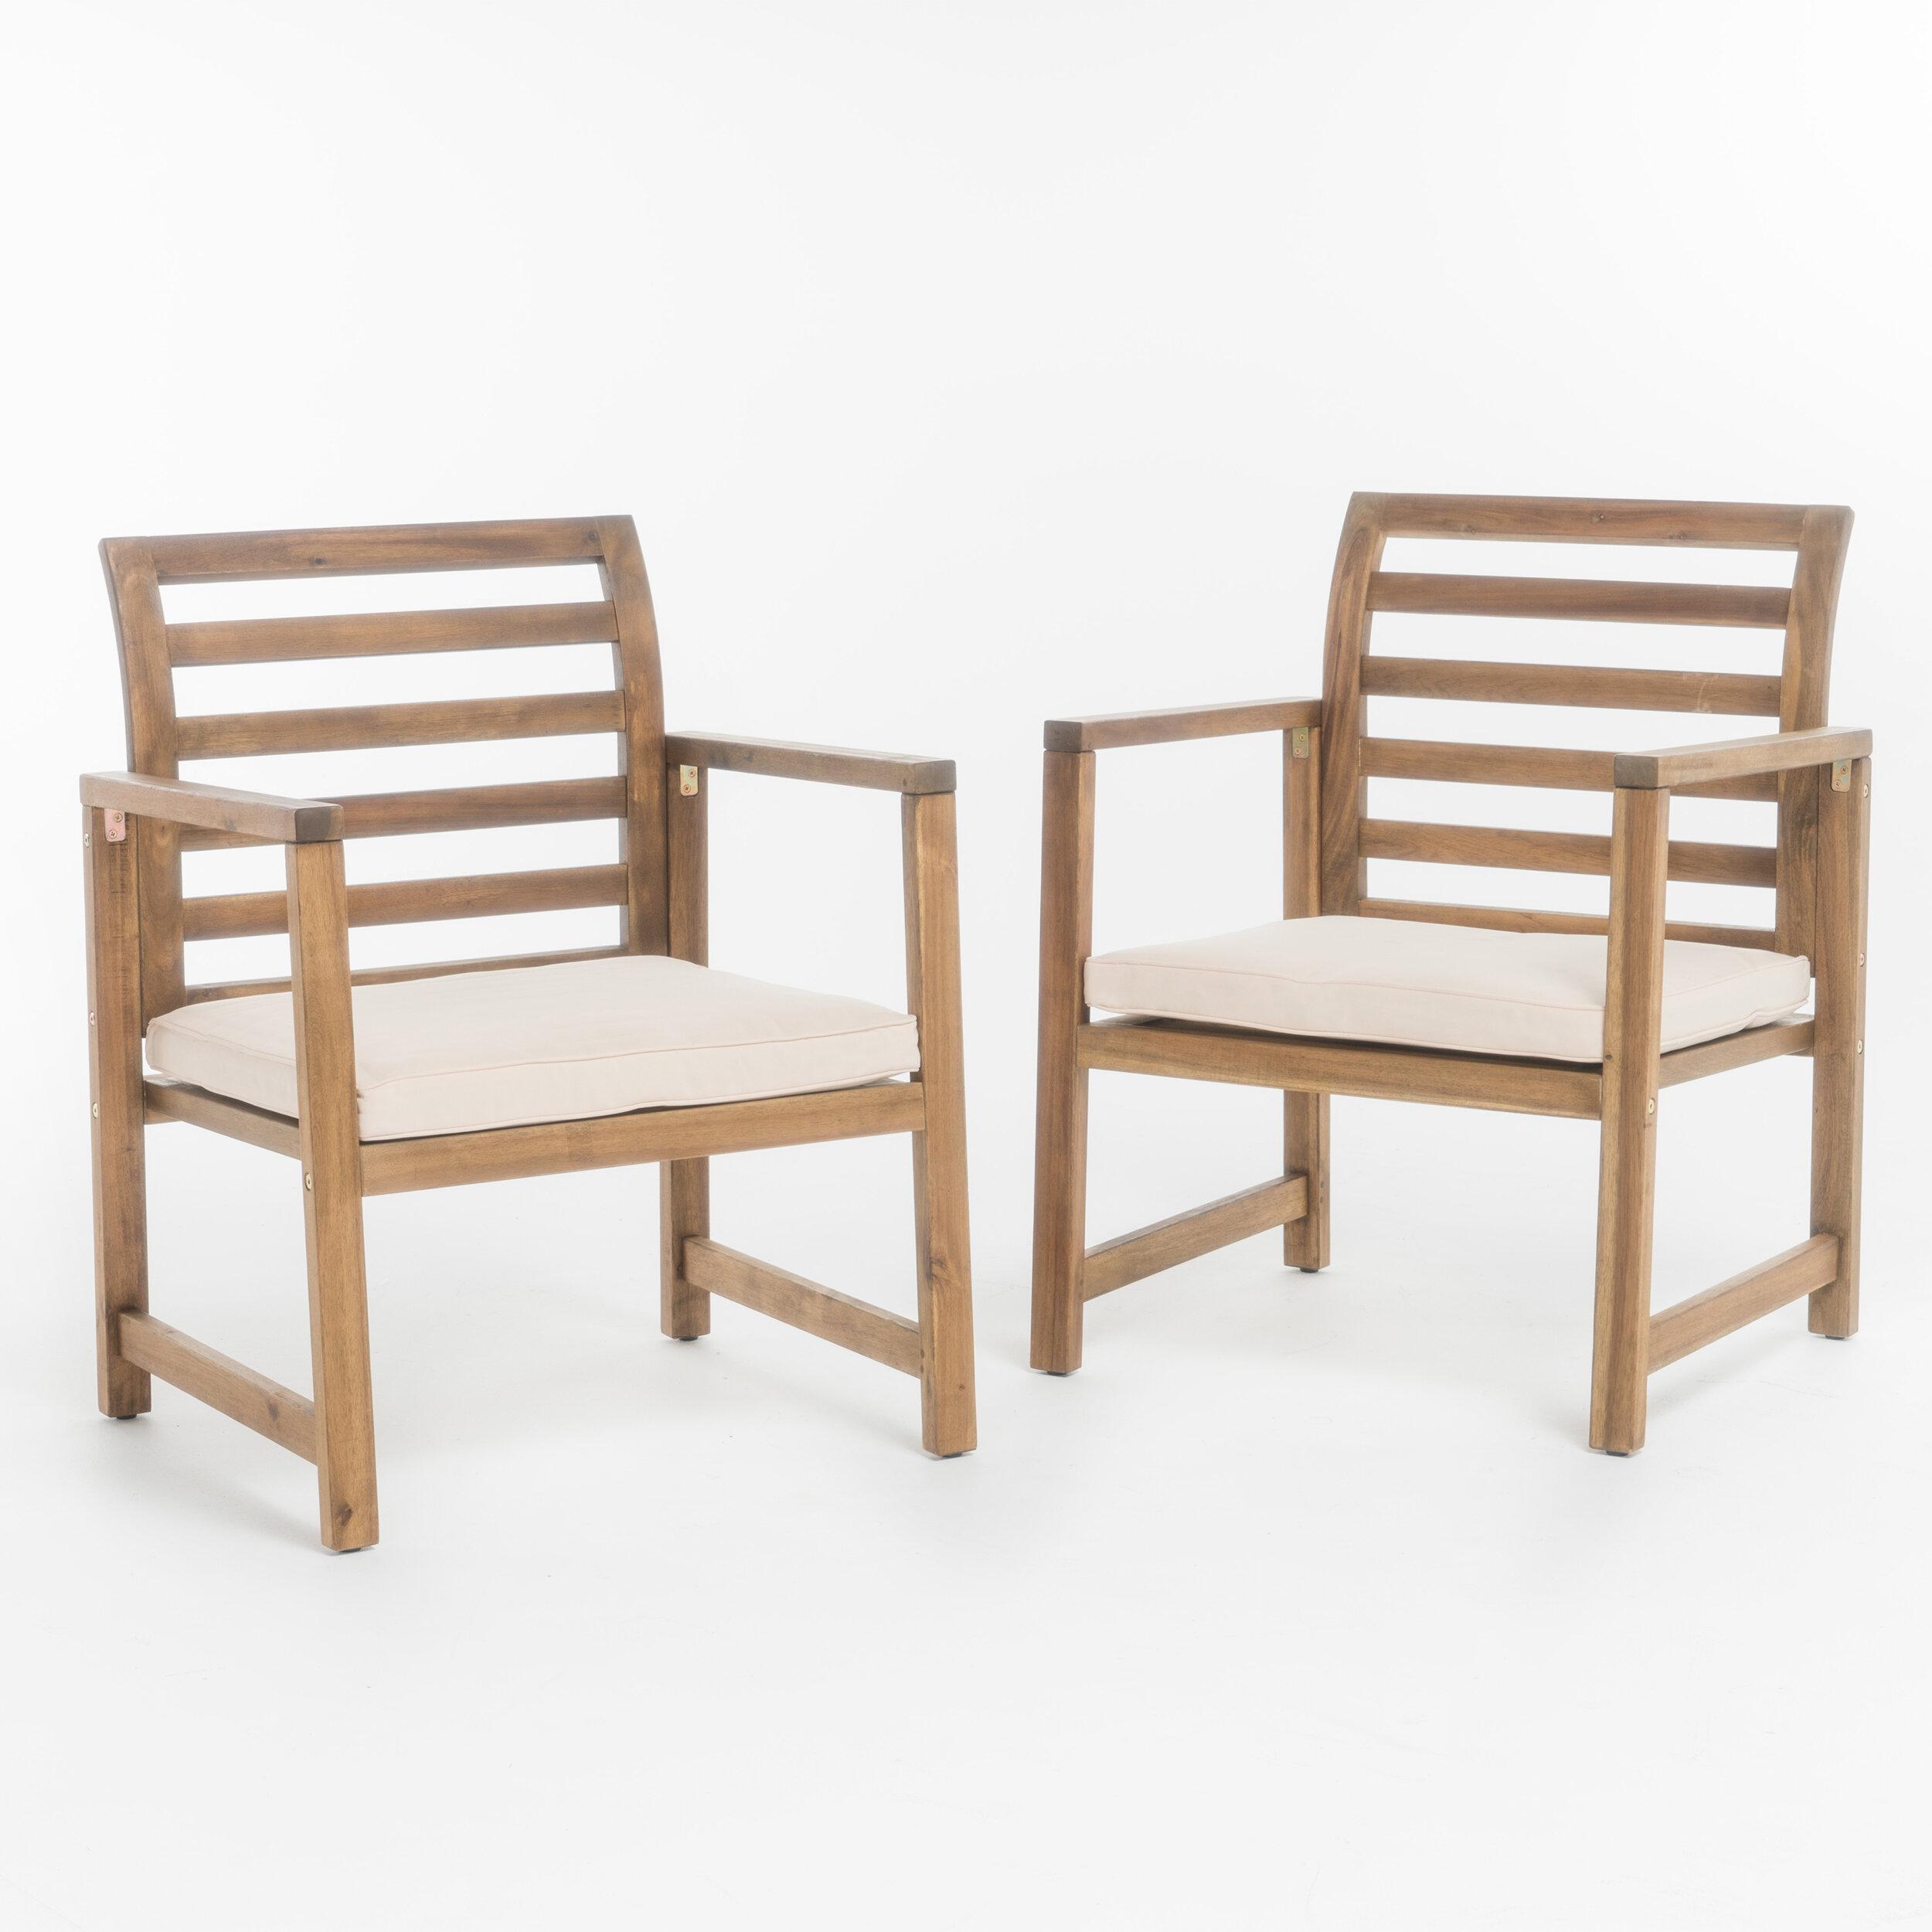 Beau Gaynelle Outdoor Arm Chair With Cushion